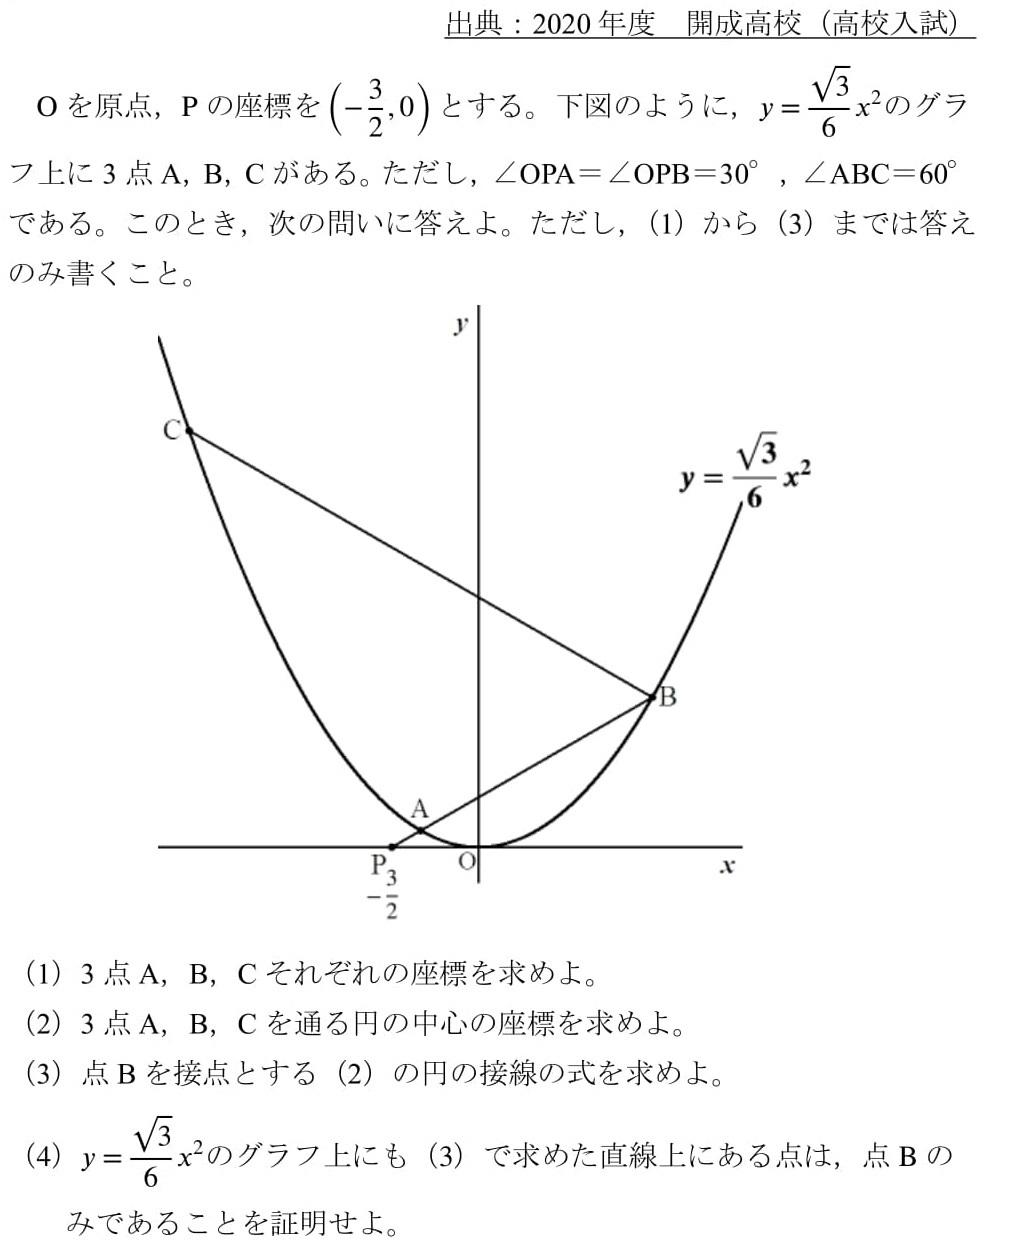 art45_kaiseikan-1.jpg